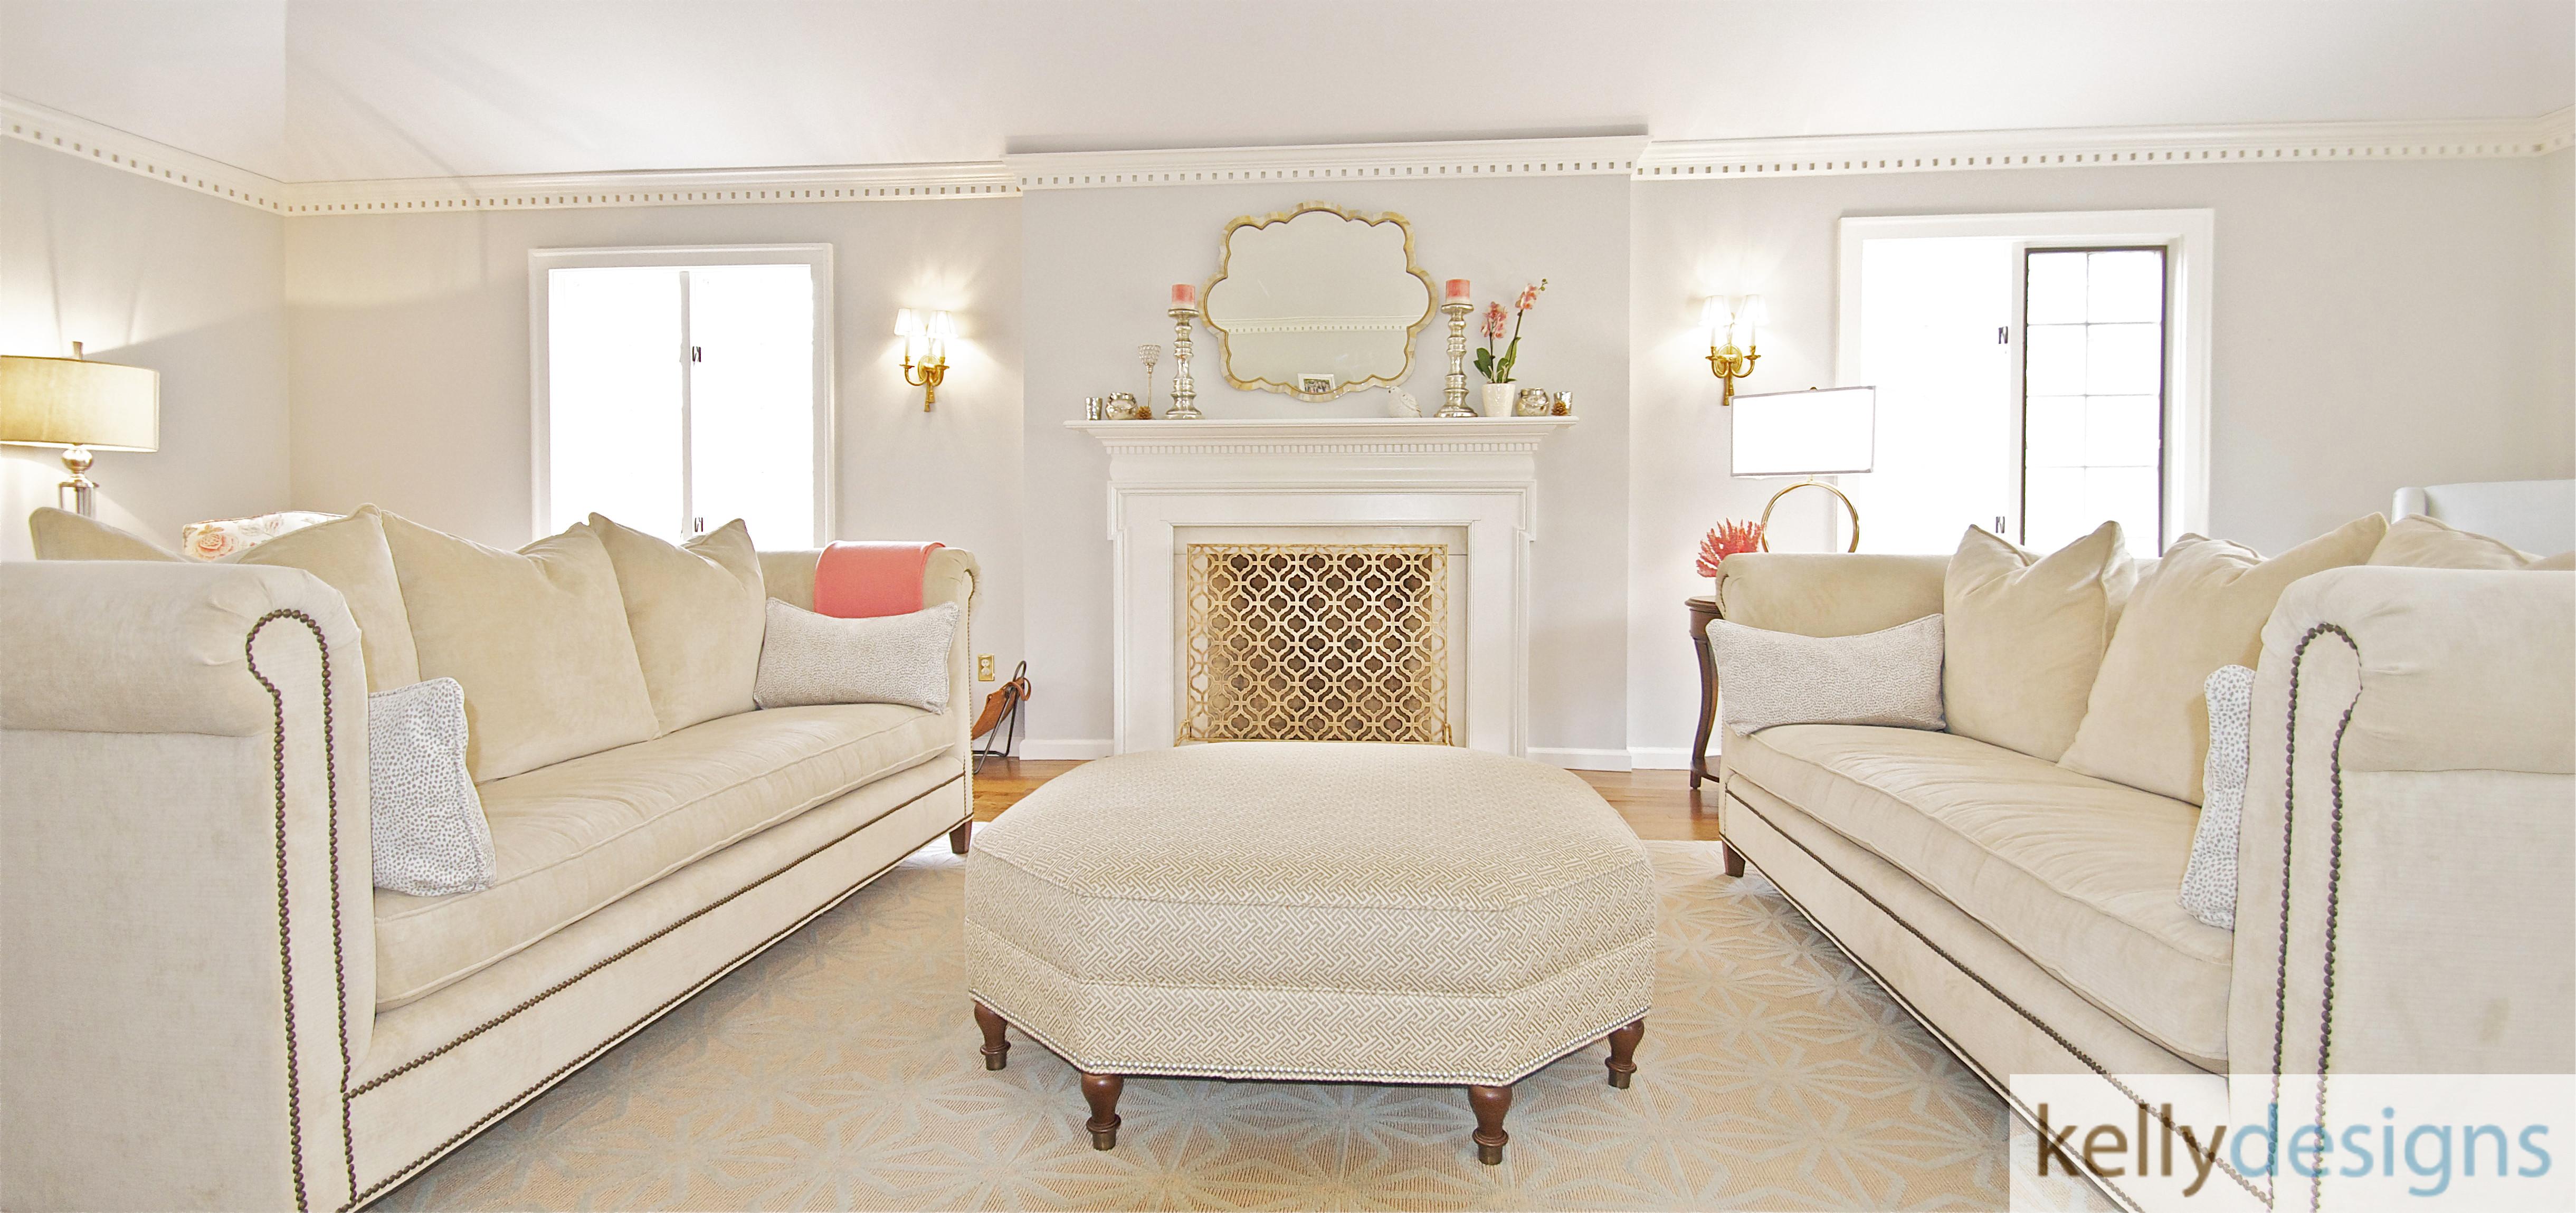 Fairfield Living Room Renovation - Interior Design by kellydesigns